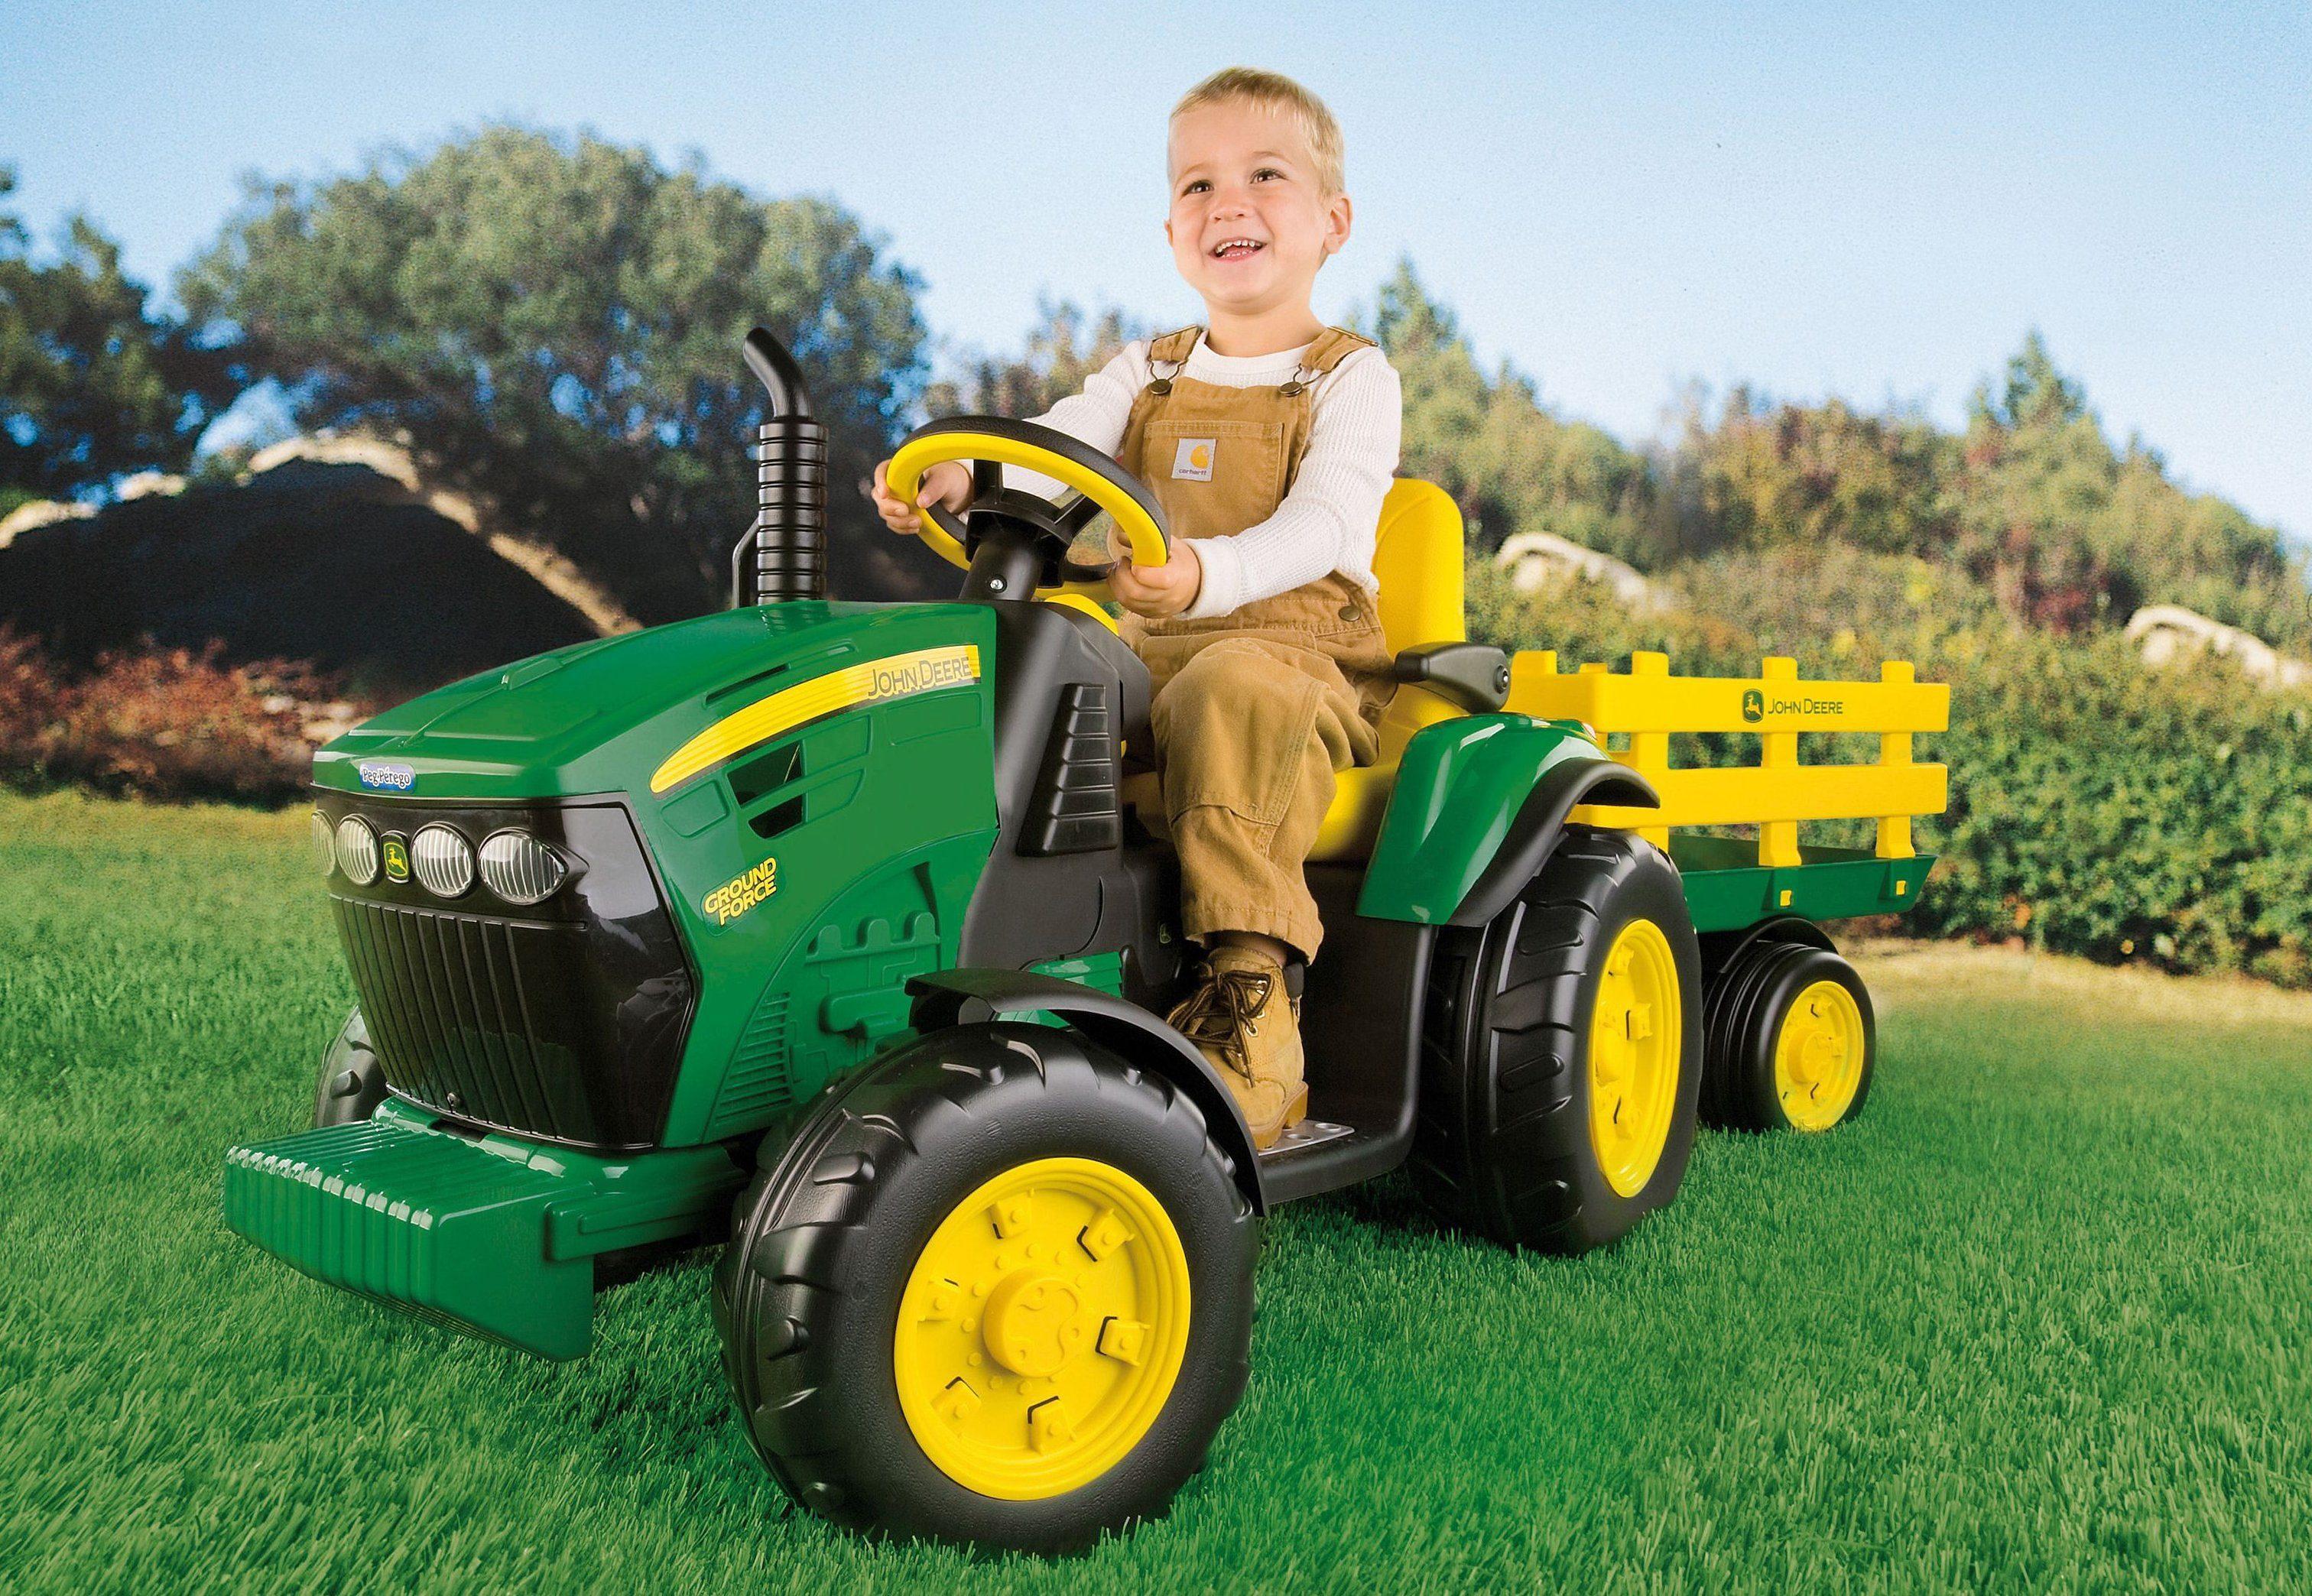 Peg pérego elektrofahrzeug für kinder traktor mit anhänger